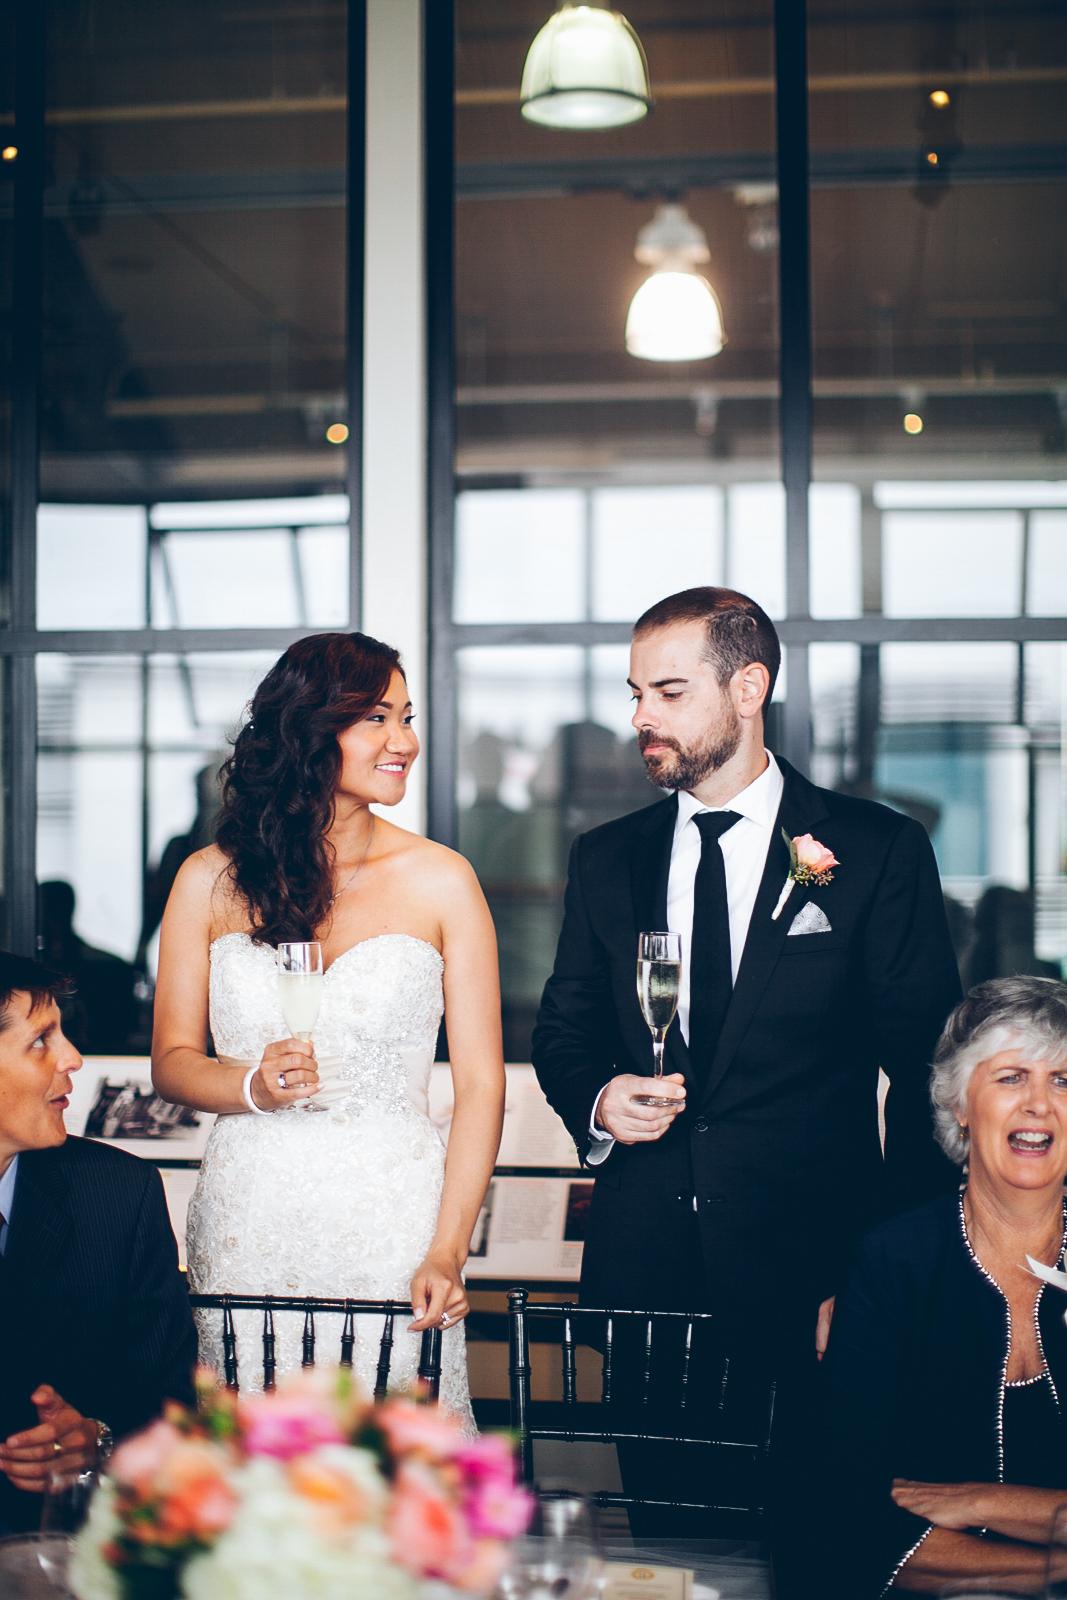 San_francisco_city_hall_wedding_photography_meegan_travis_ebony_siovhan_bokeh_photography_73.jpg